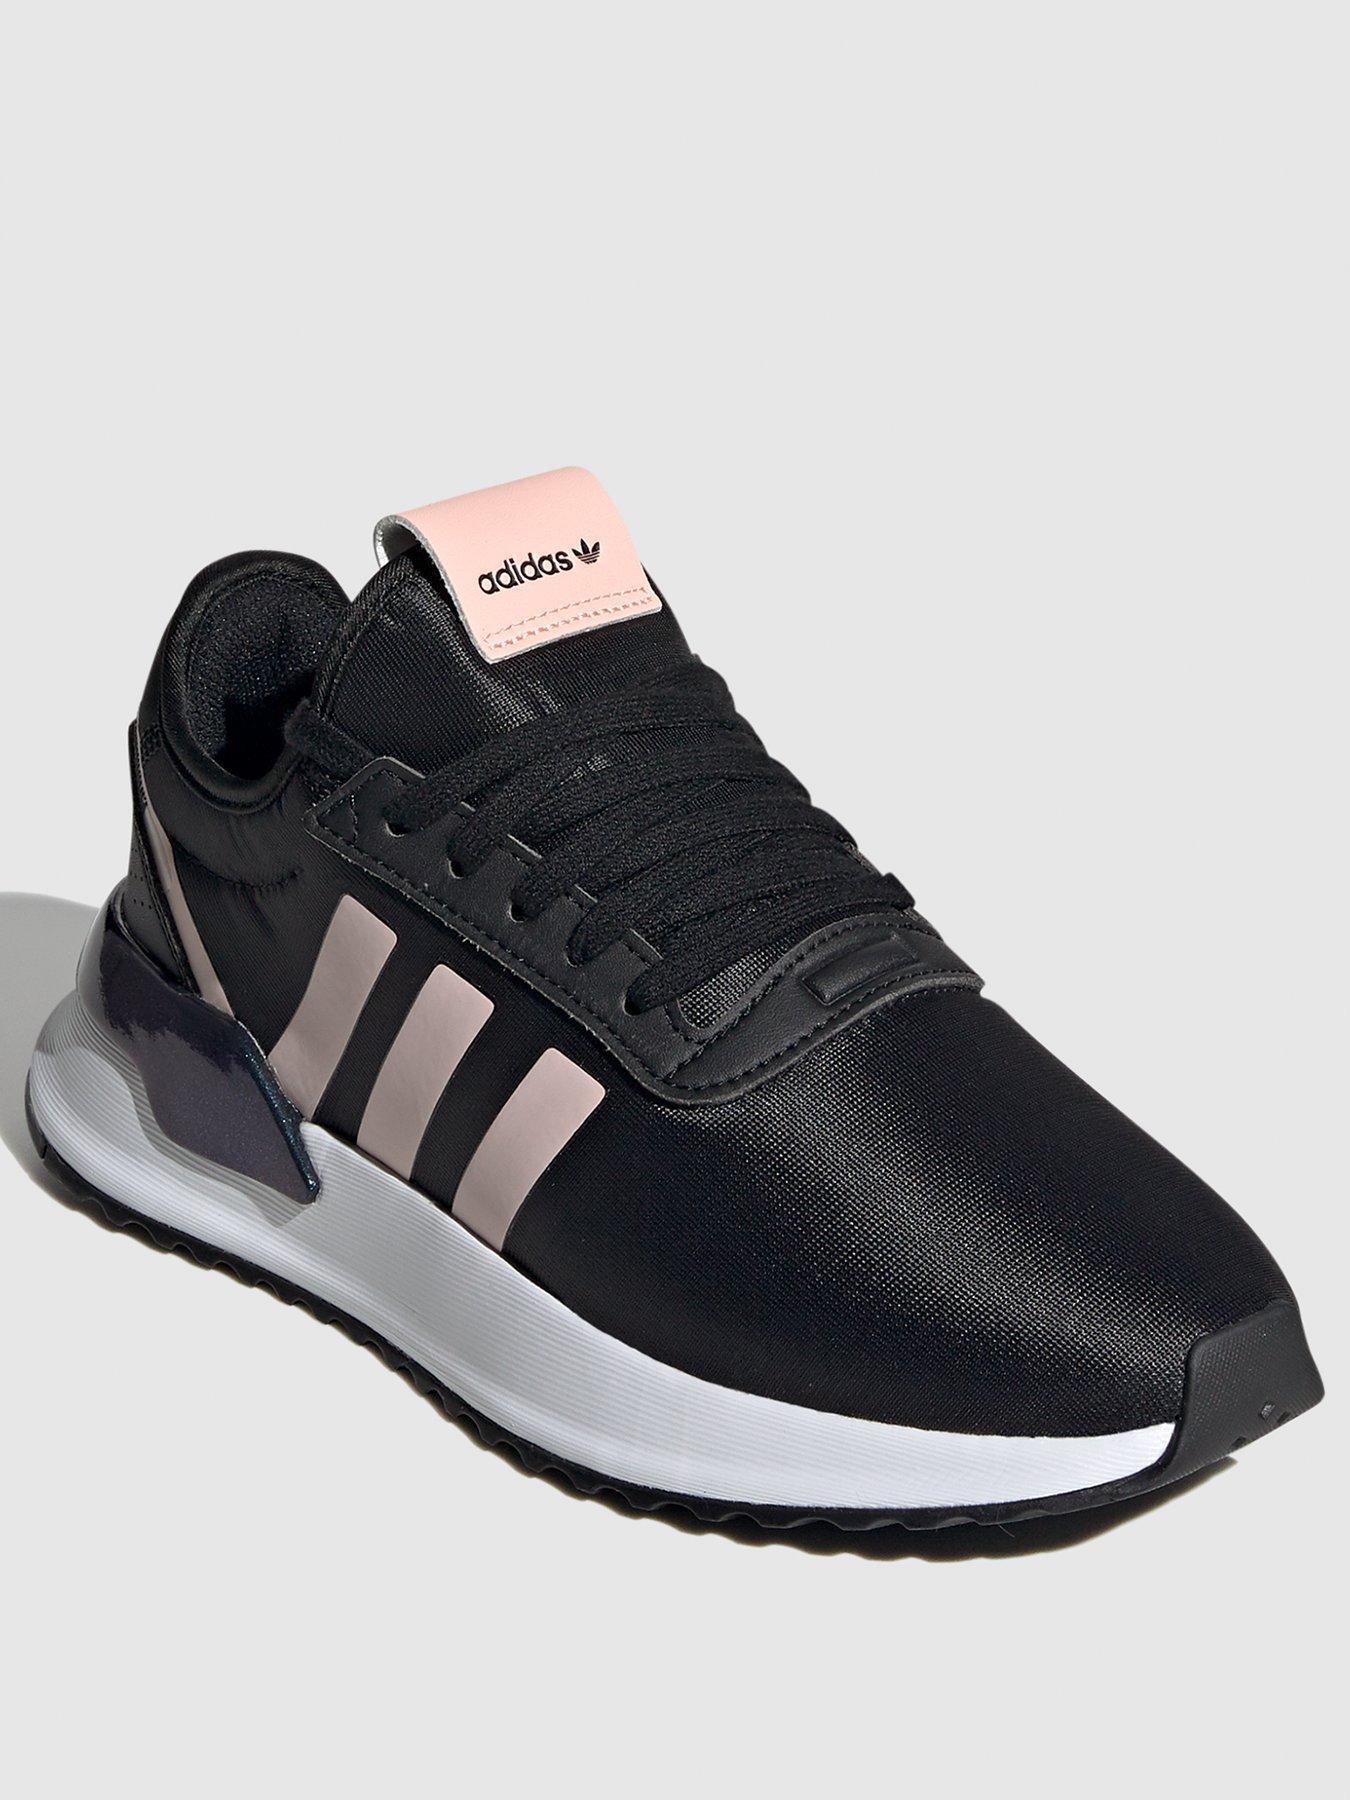 adidas u path black and pink